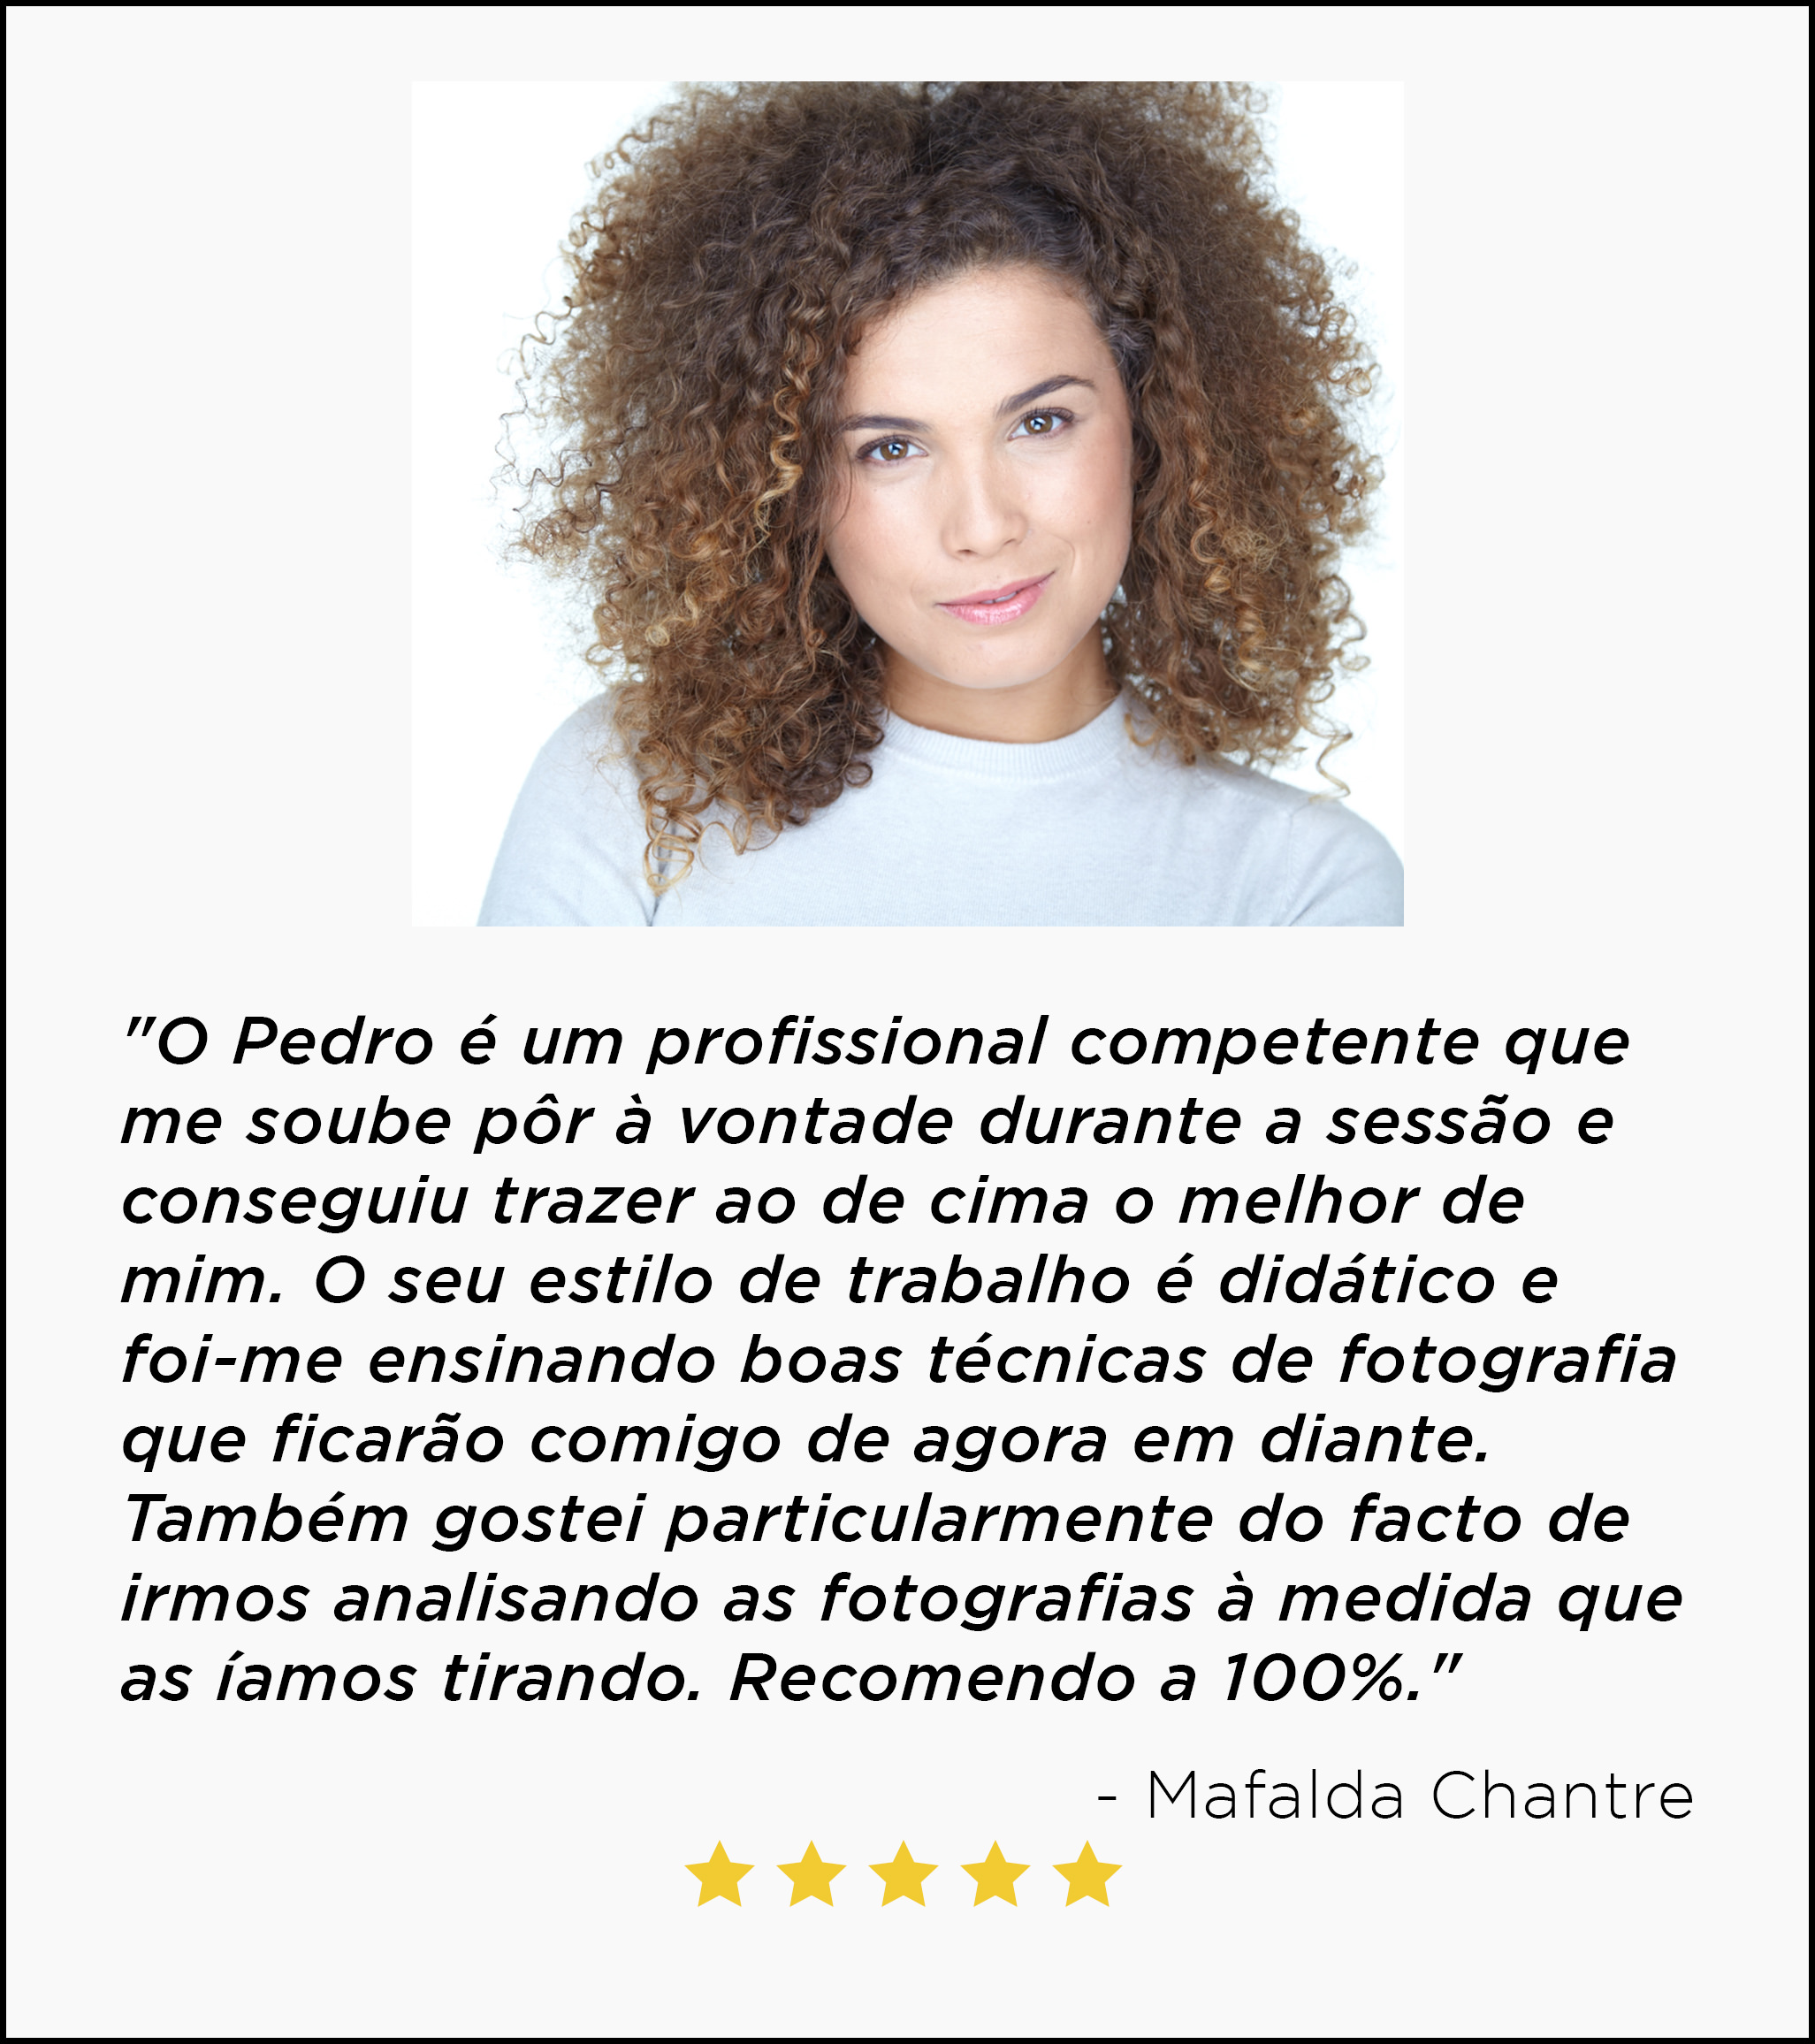 Mafalda Chantre.jpg